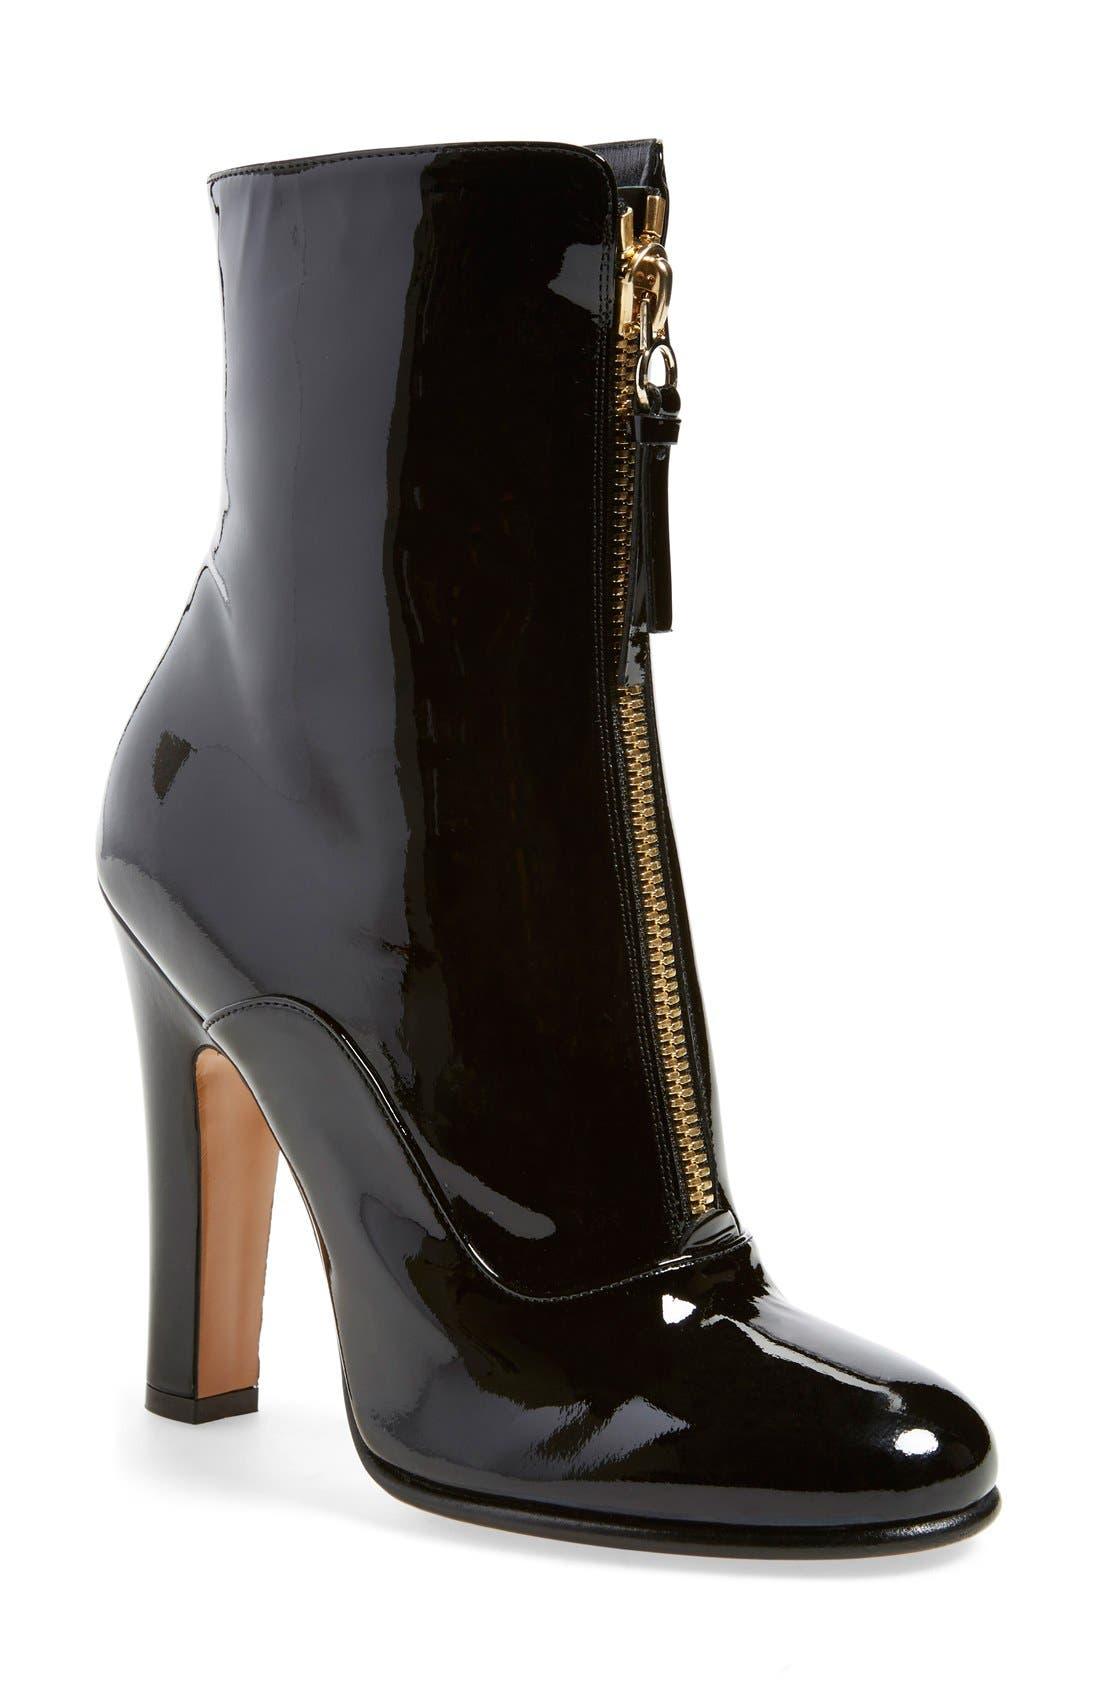 Main Image - Valentino 'Rebelle' Round Toe Zip Bootie (Women)